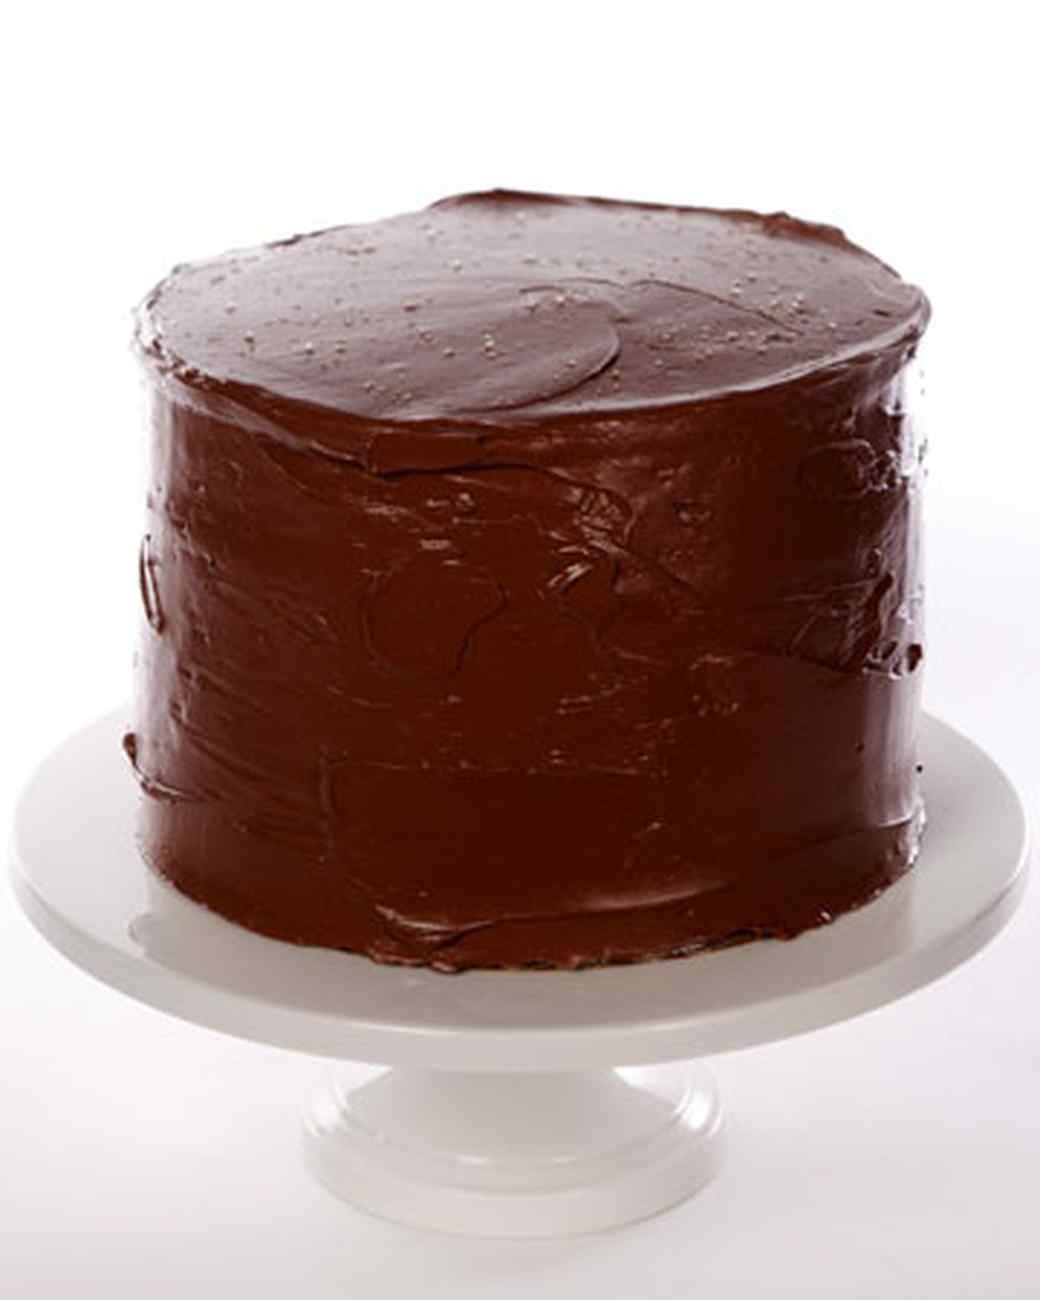 Martha stewart dark chocolate cake